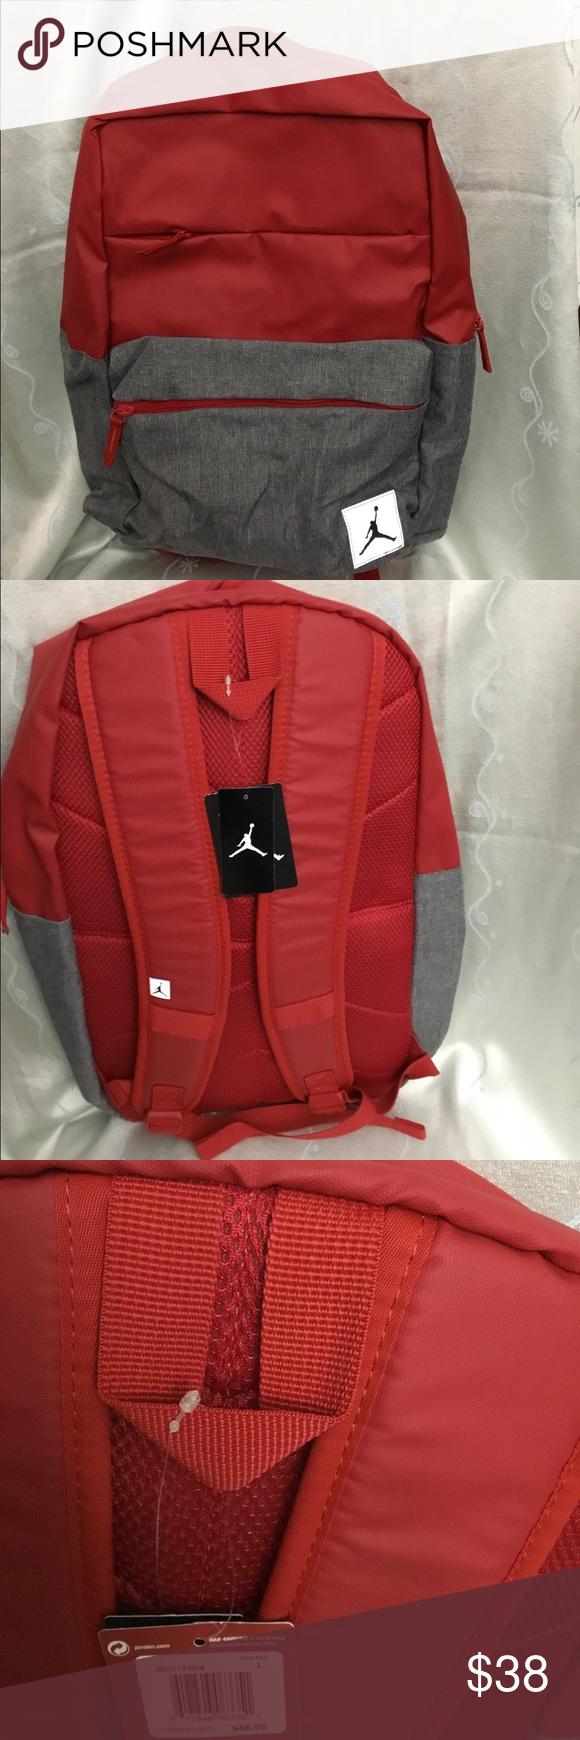 "ea91761c9c Jordan Pivot Backpack Brand new with tag Jordan Pivot Backpack. Approximate  measurements  19.5"""